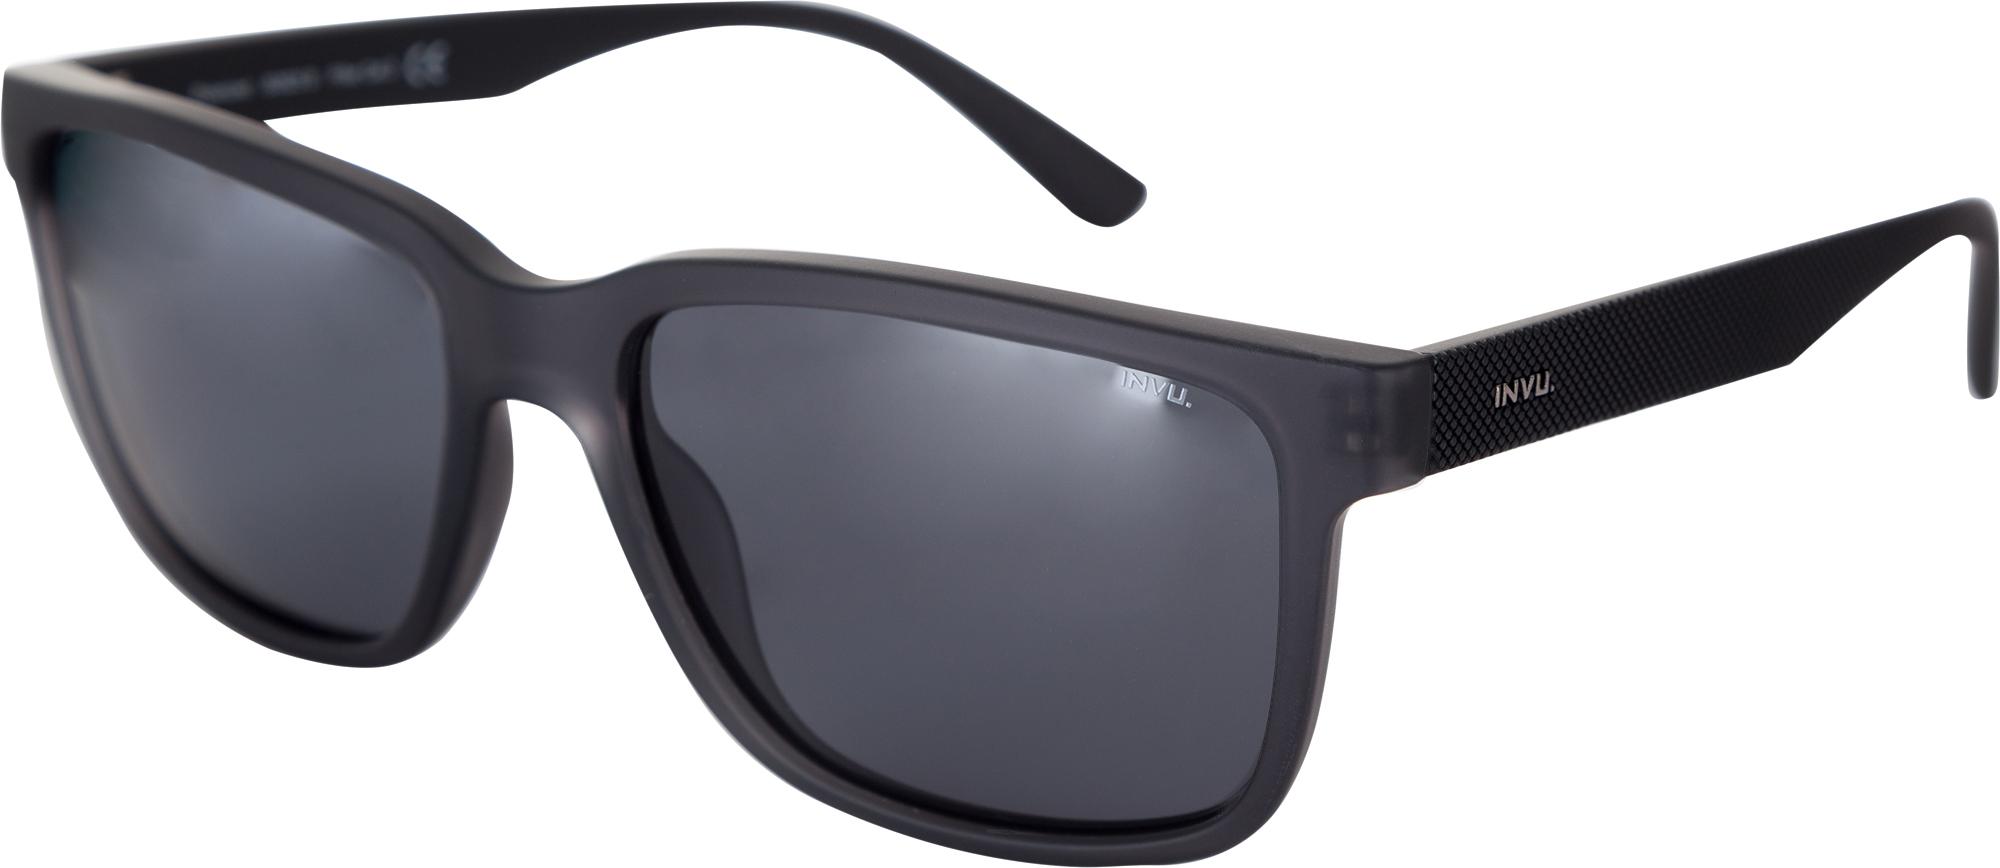 Invu Солнцезащитные очки мужские Invu